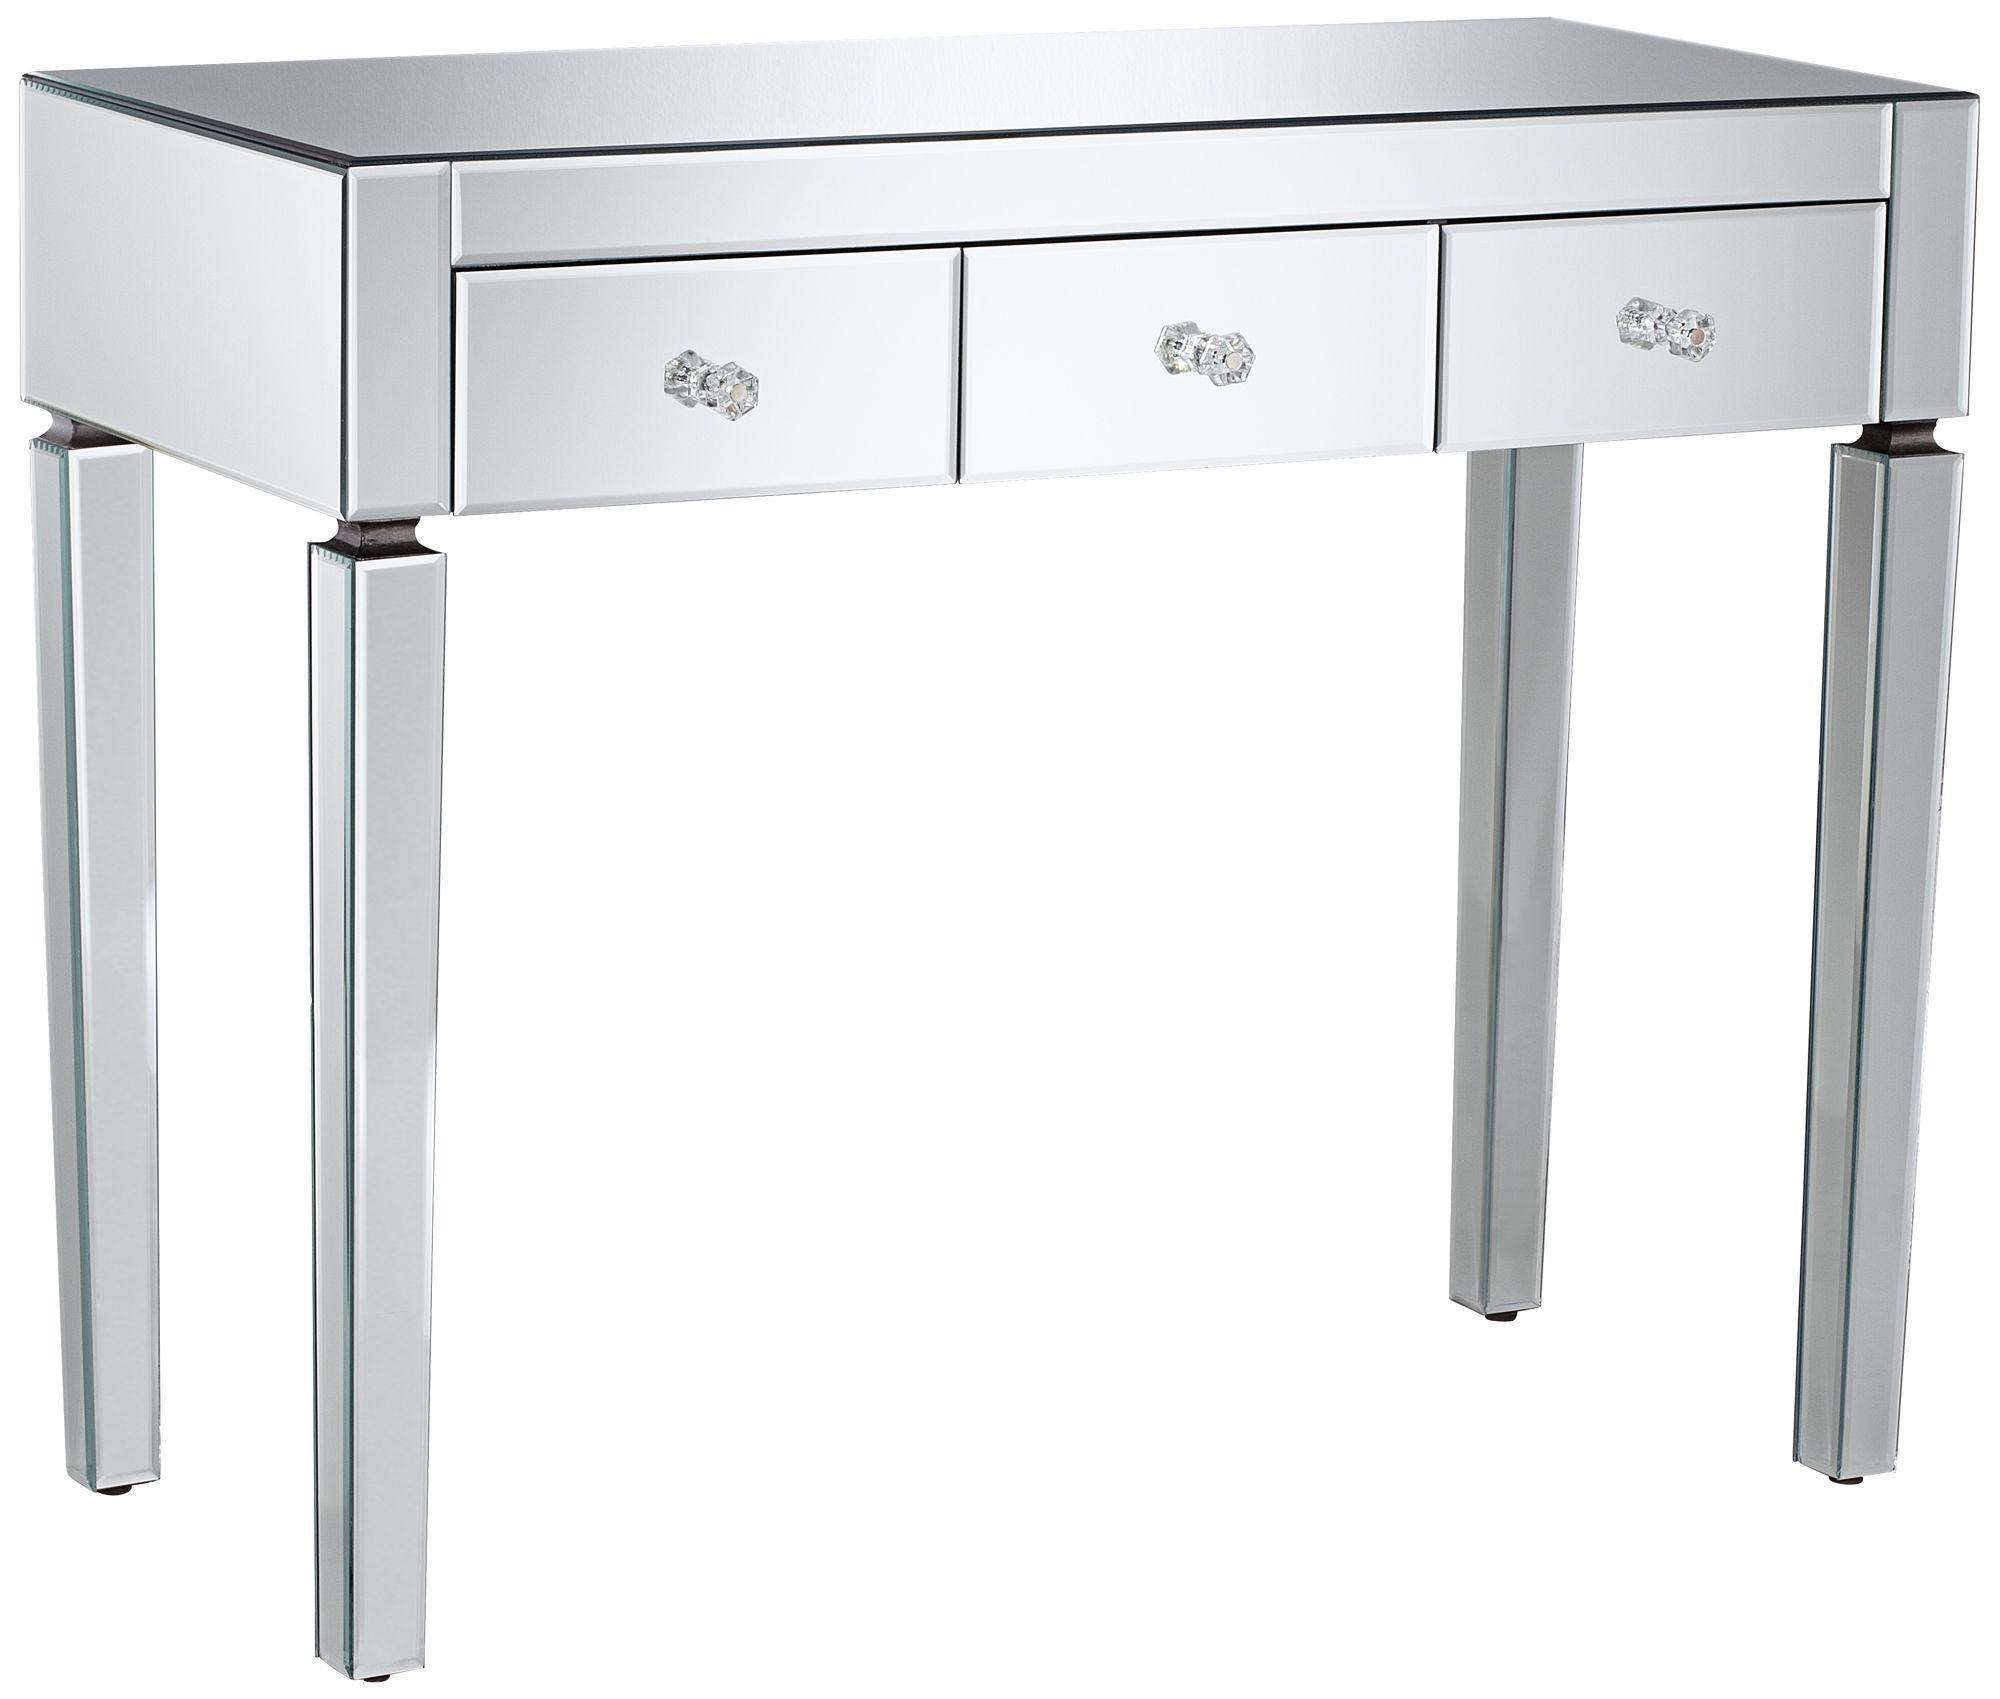 desk mirror design stylish of vanity photos ideas mirrored gallery